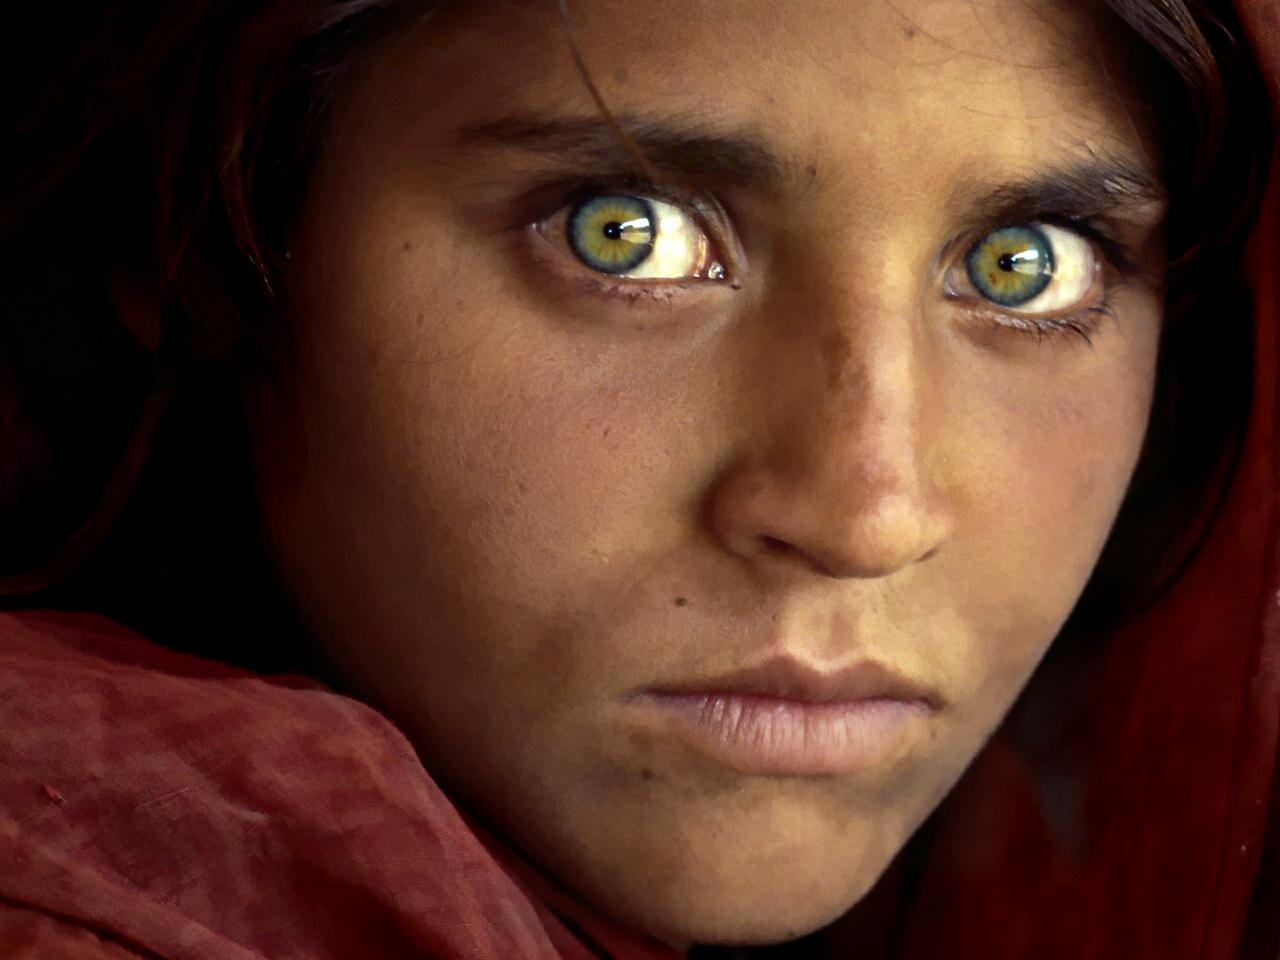 La niña afgana, 1985. Fotografía de Steve McCurry